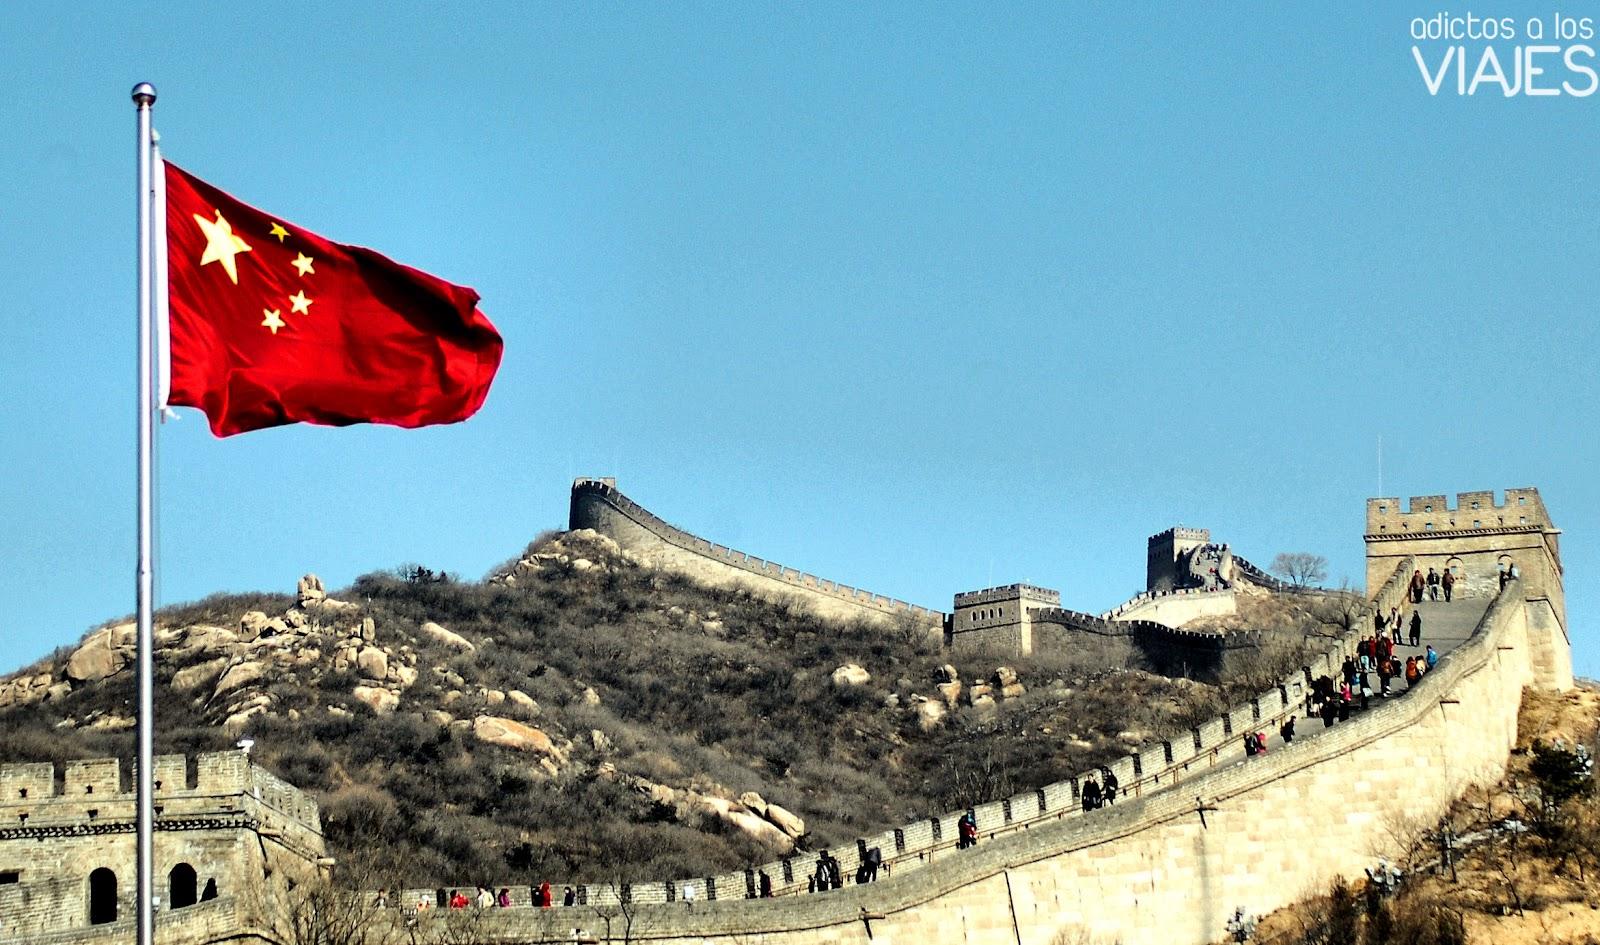 Mi viaje a la muralla china adictos a los viajes blog for Q es la muralla china